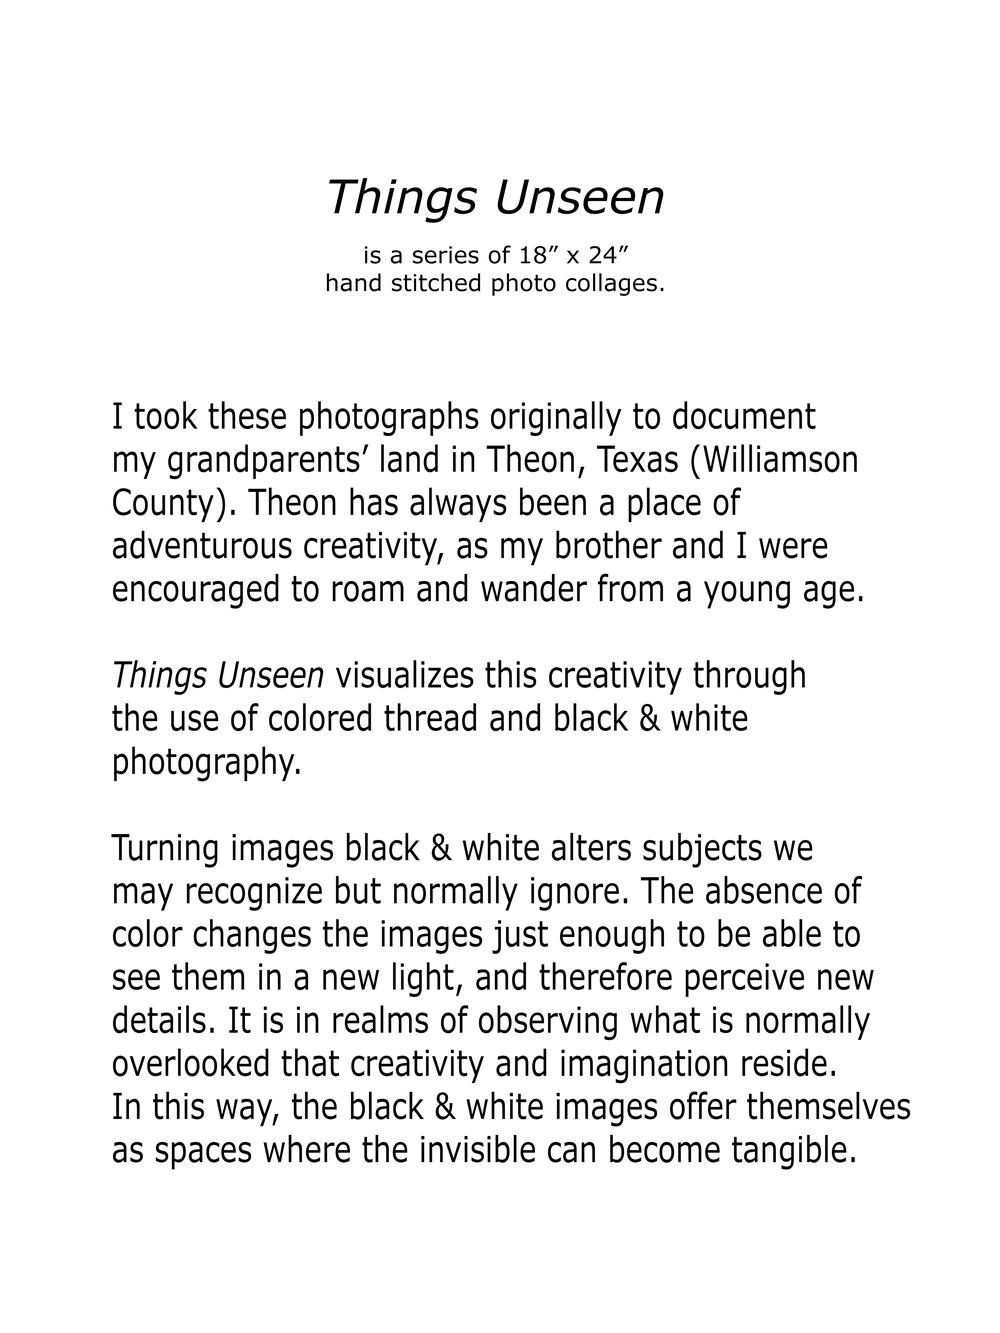 Things_Unseen_statement2.jpg